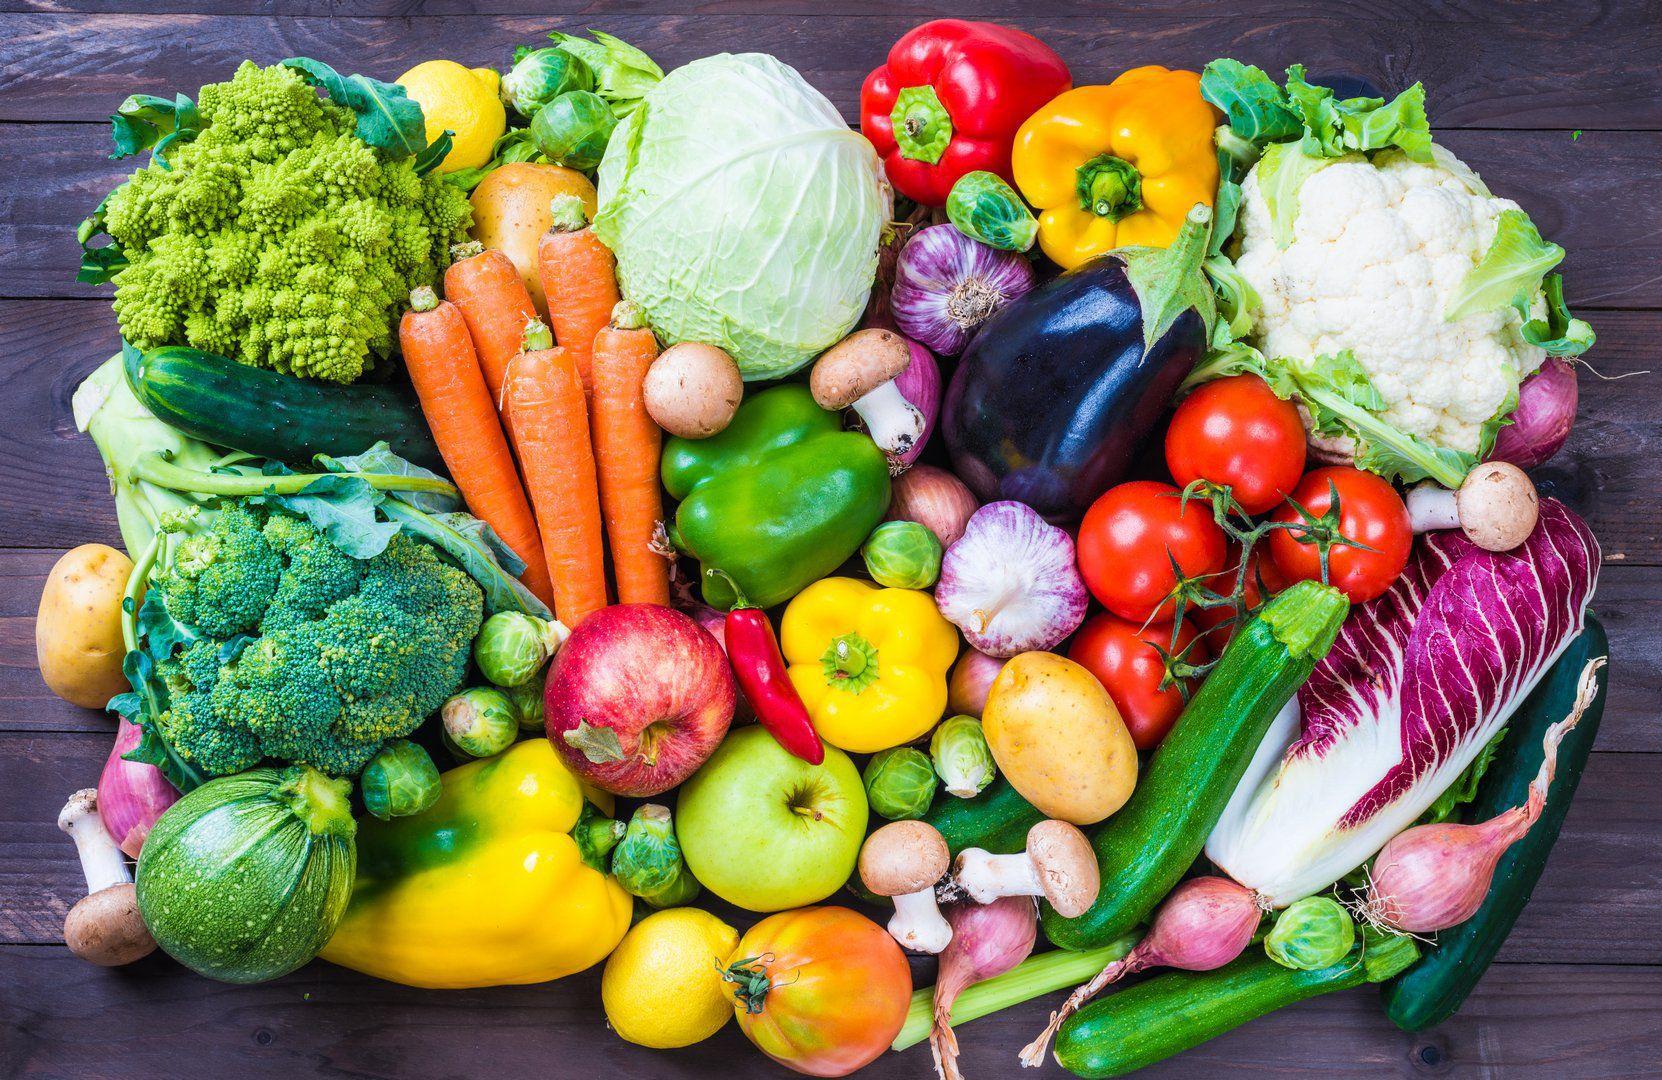 نظام غذائي مكون من 2 فواكه و 3 خضروات